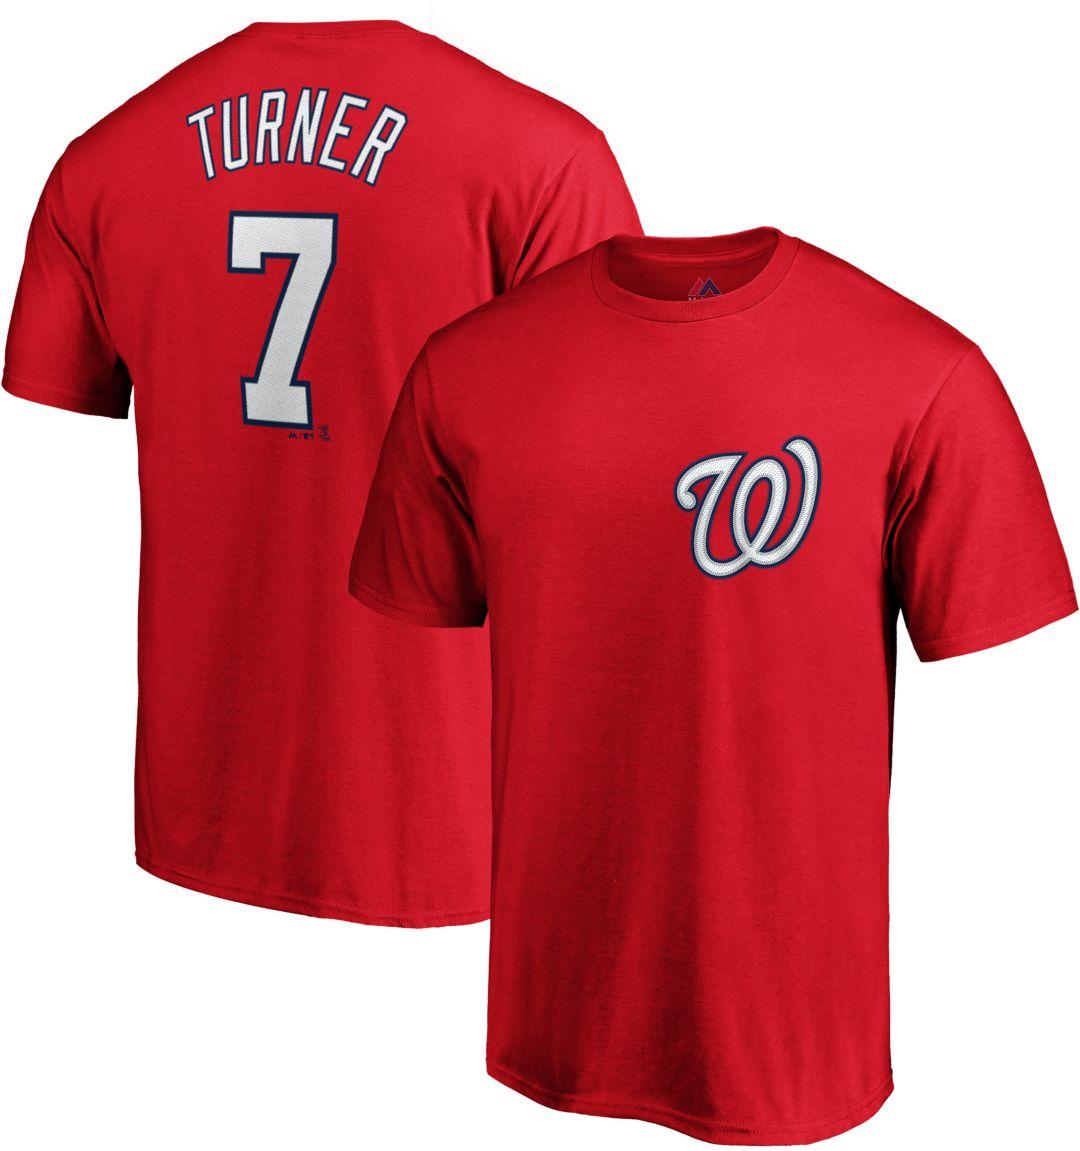 buy popular ff2f4 c983a Majestic Men's Washington Nationals Trea Turner #7 Red T-Shirt